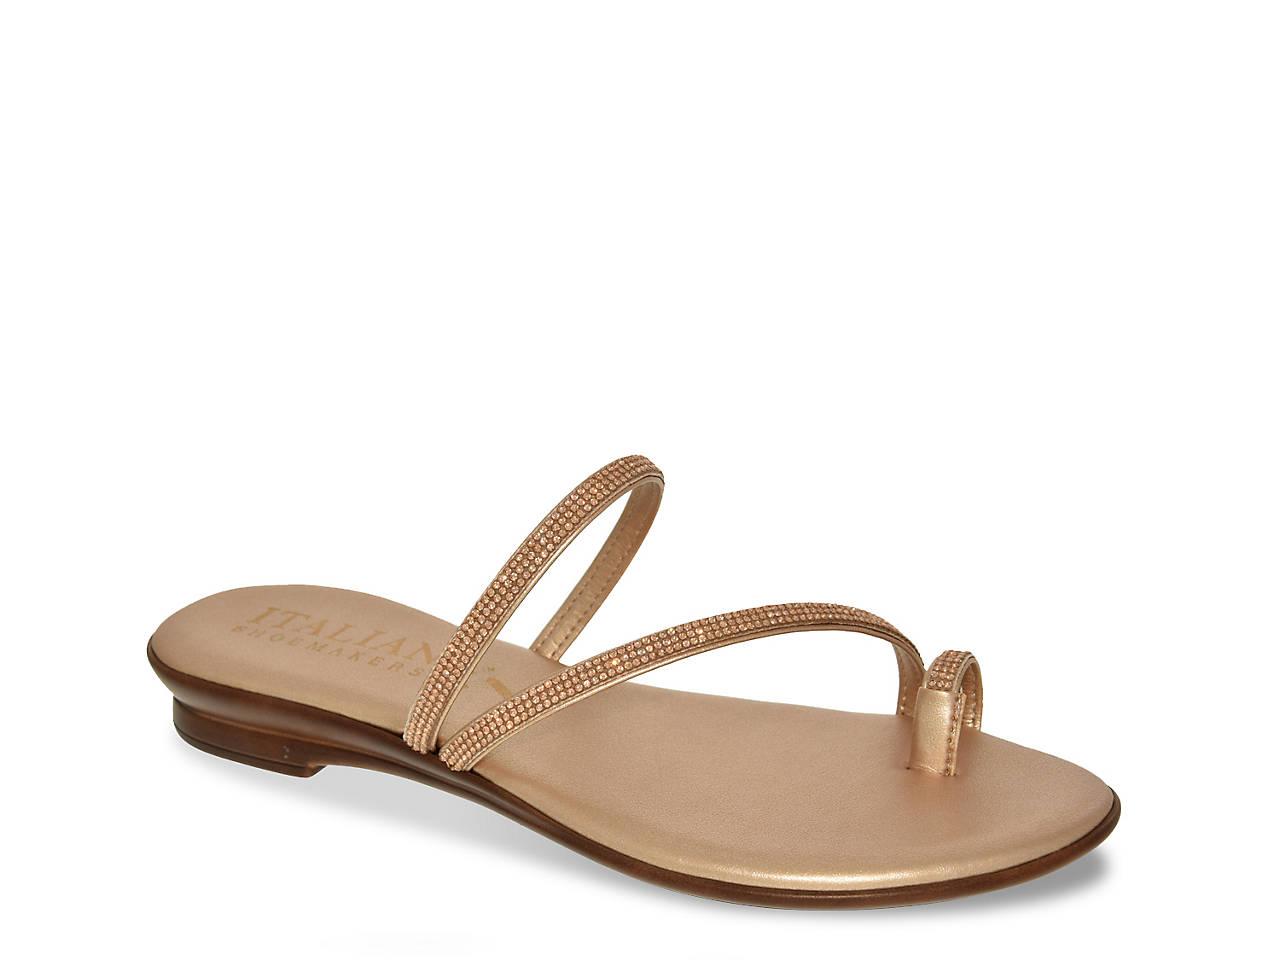 b1293c4b38 Italian Shoemakers Jewel Flat Sandal Women's Shoes | DSW